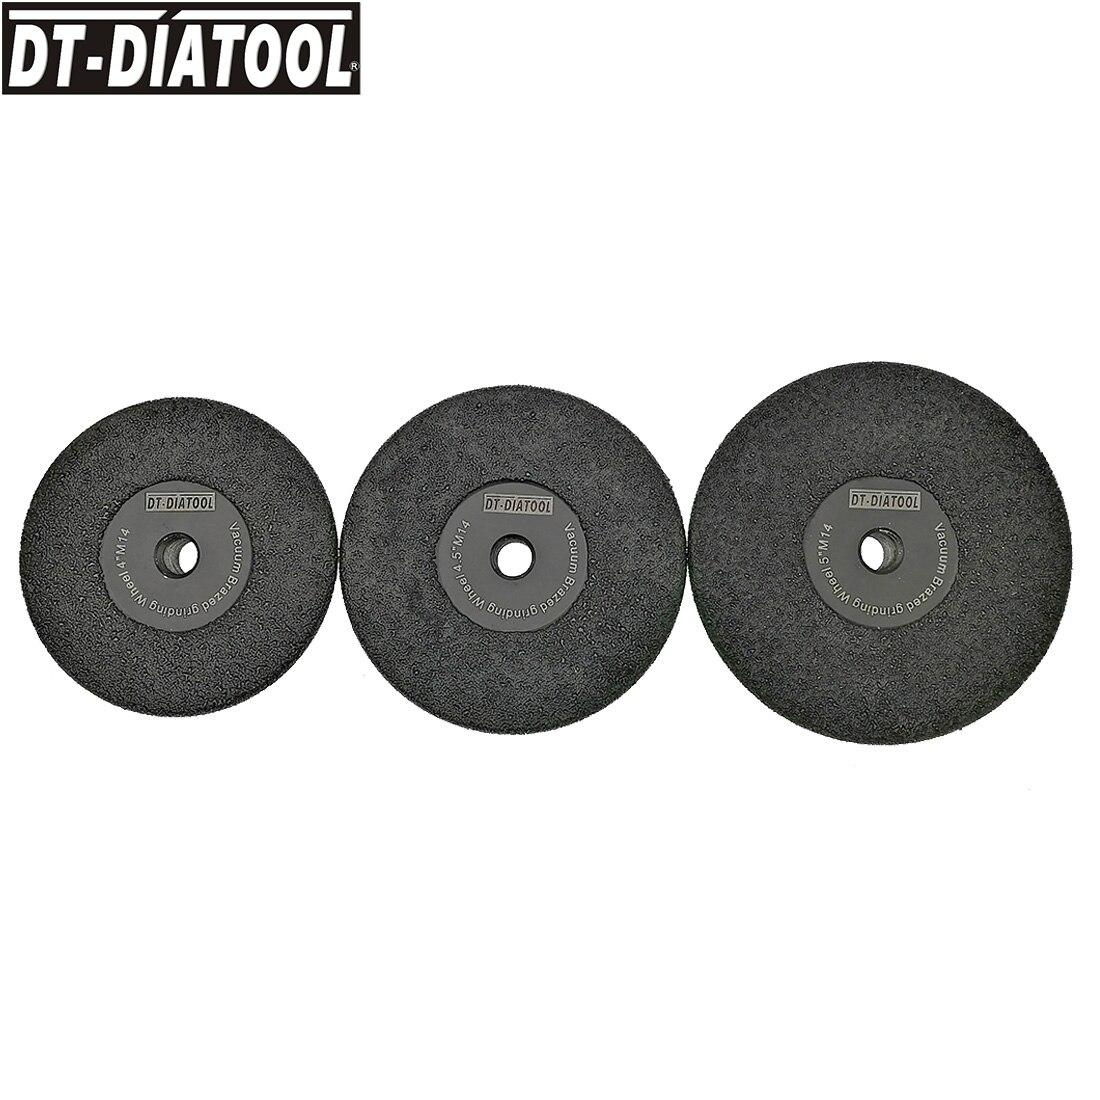 DT-DIATOOL 1piece Vacuum Brazed Diamond Flat Grinding Wheel M14 #30 Diameter 4 Inches/105mm 4.5/115mm 5/125mm Shaping Wheel dia115mm vacuum brazed diamond flat grinding wheel m14 30 40 4 5 shaping wheel cutting disc for marble granite